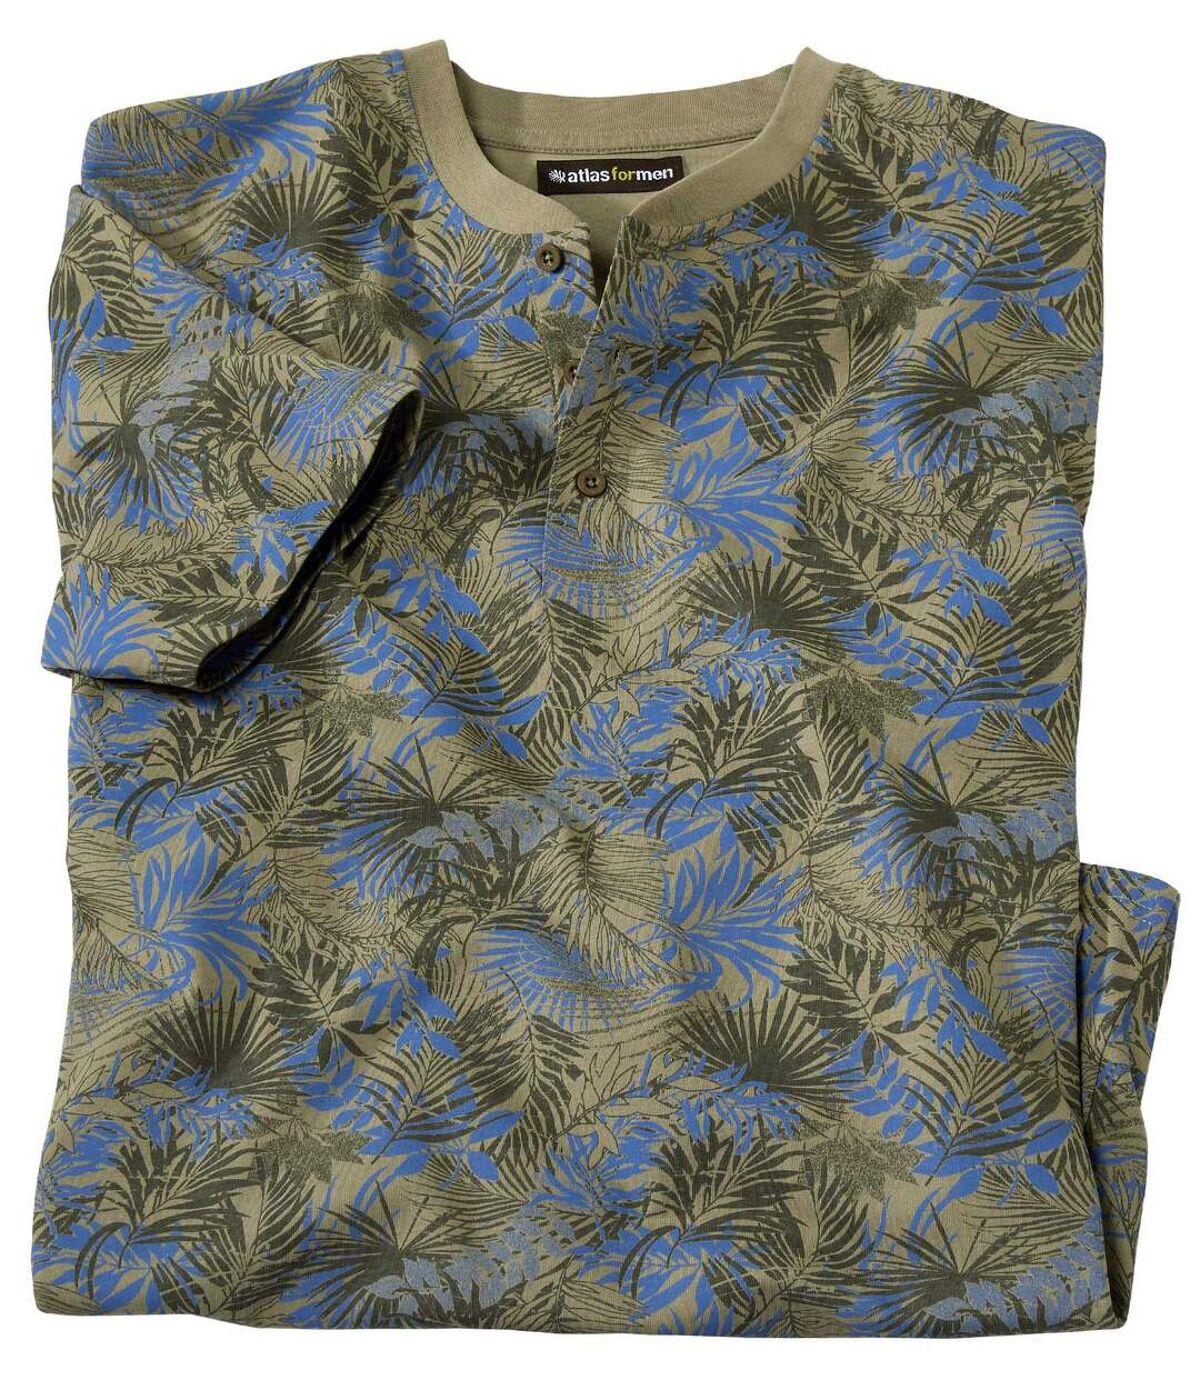 Men's Camouflage T-Shirt with Tunisian Collar - Khaki Atlas For Men